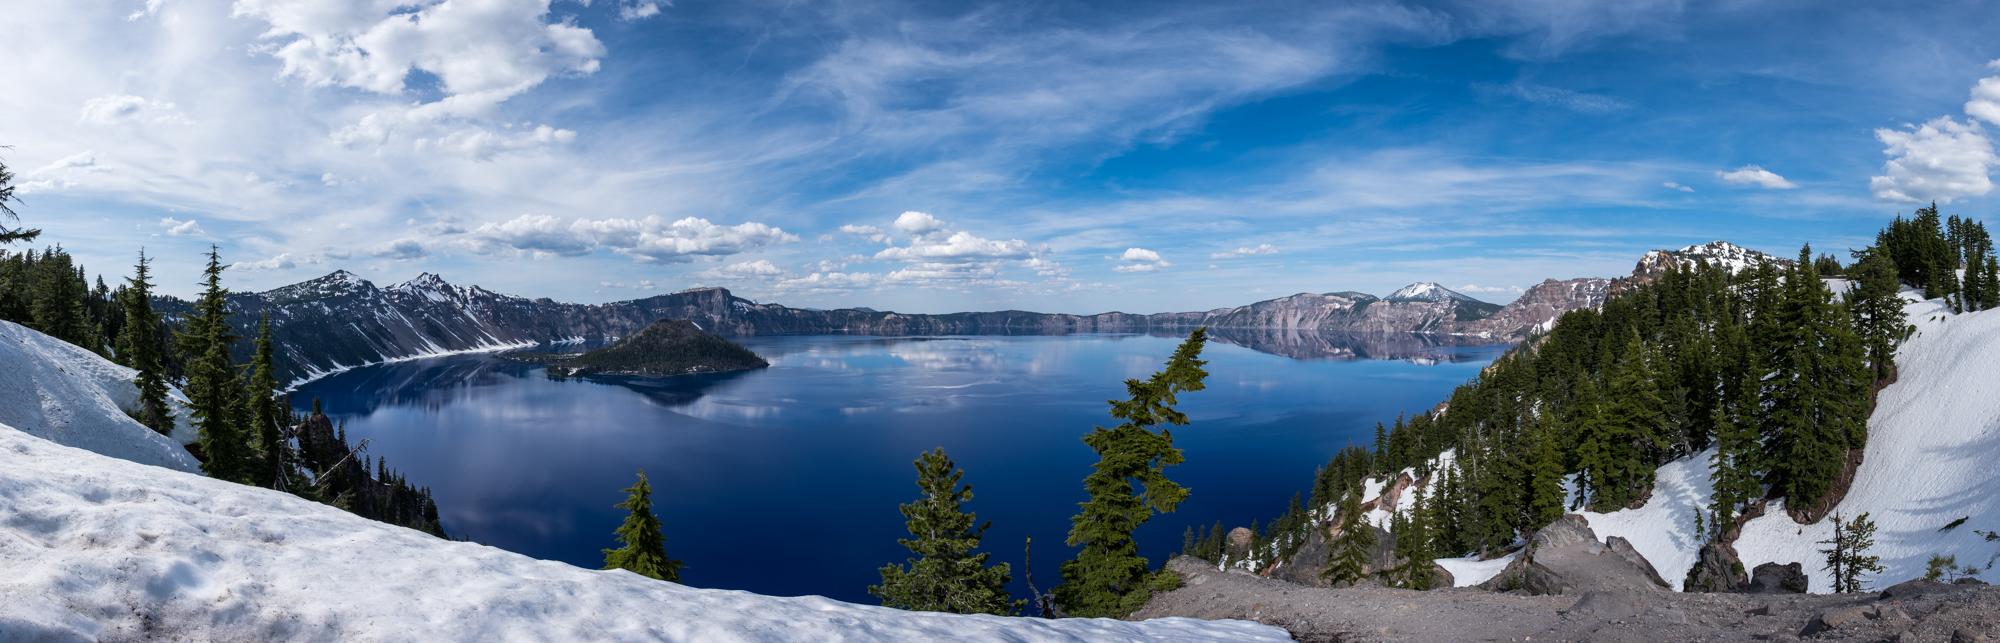 Crater Lake National Park - 016.jpg